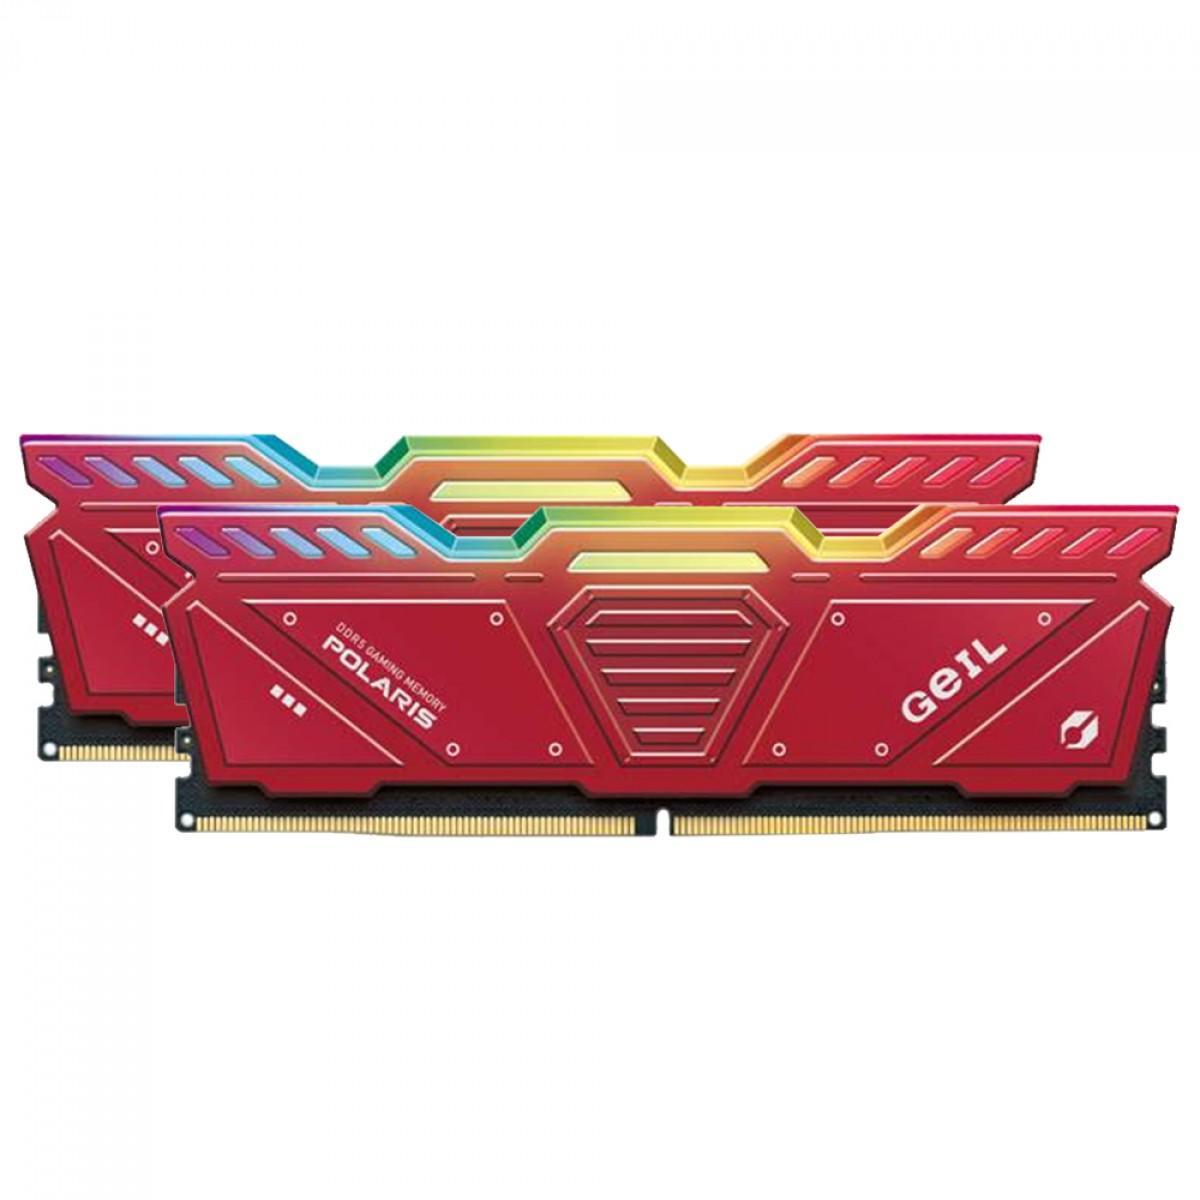 memoria-ddr5-geil-polaris-64gb-2x32gb-4800mhz-red-gosr564gb4800c40dc_130337